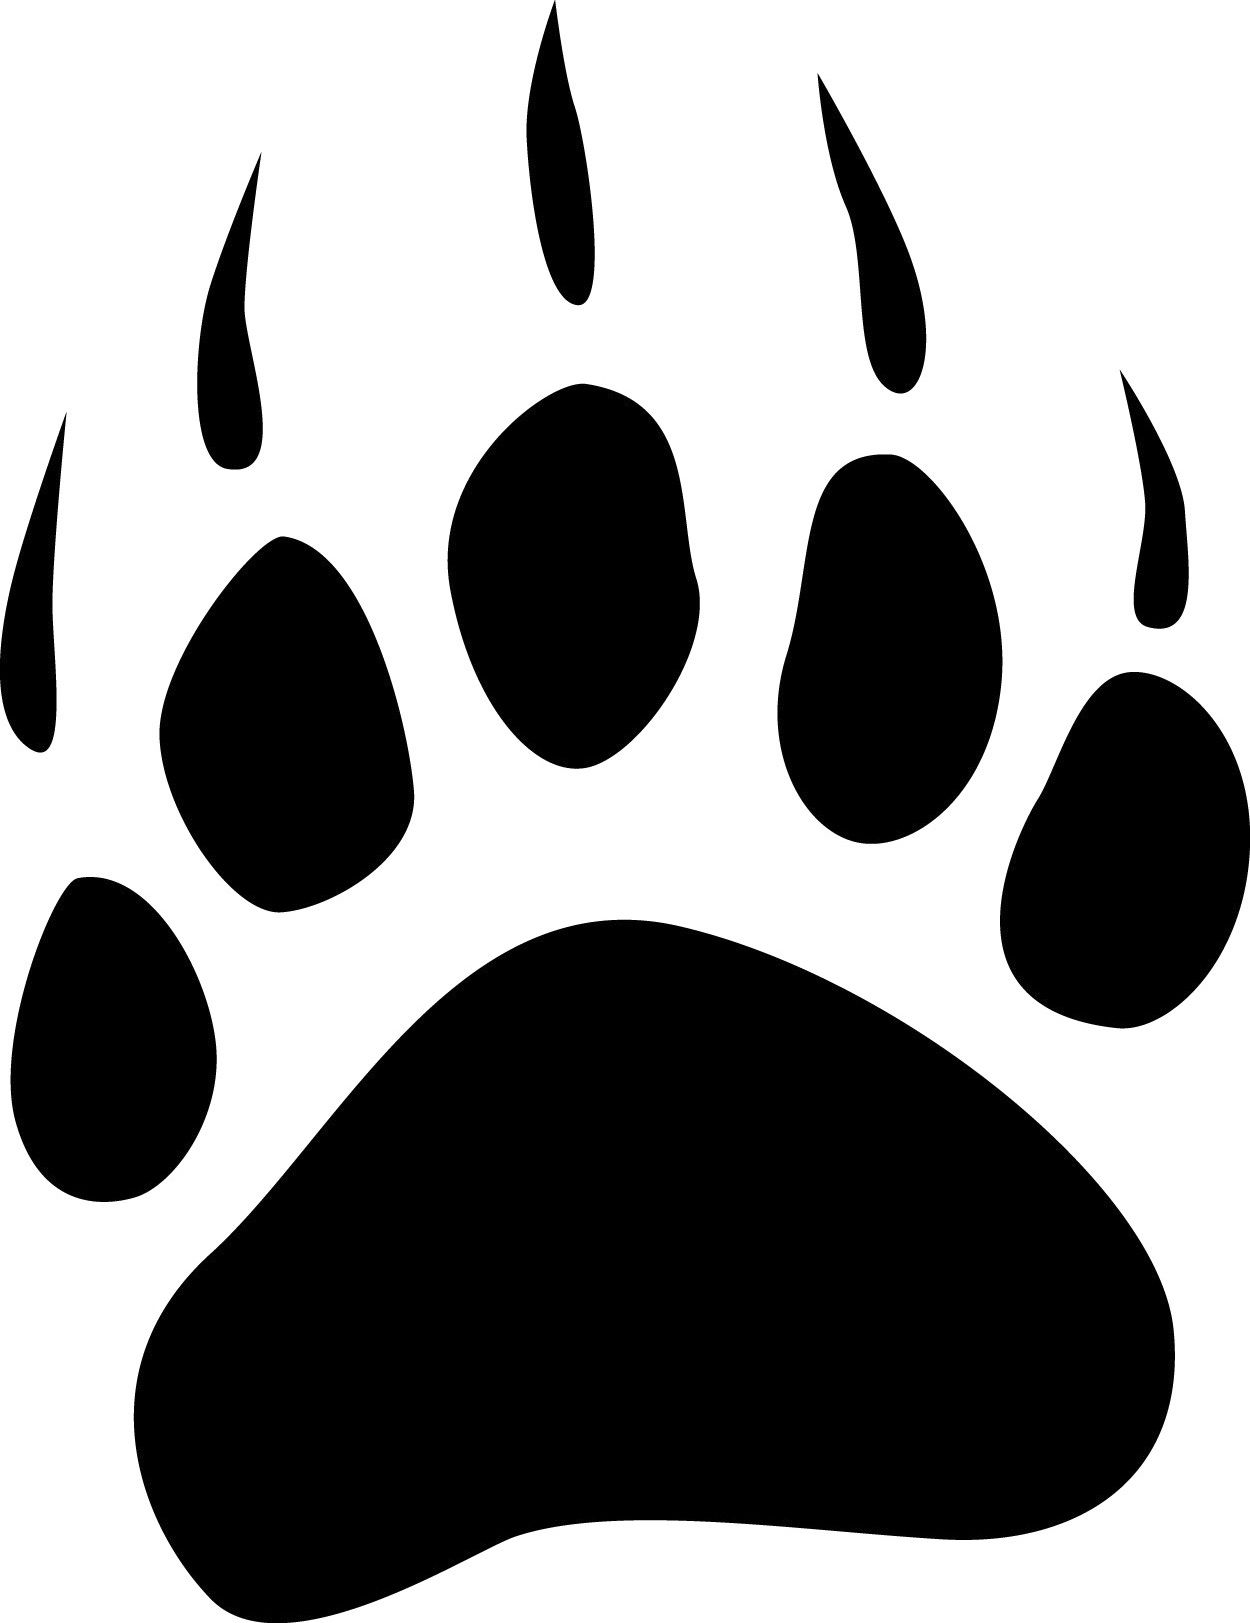 Bear Paw Tracks - ClipArt Best  Bear paw tattoos, Bear paw print